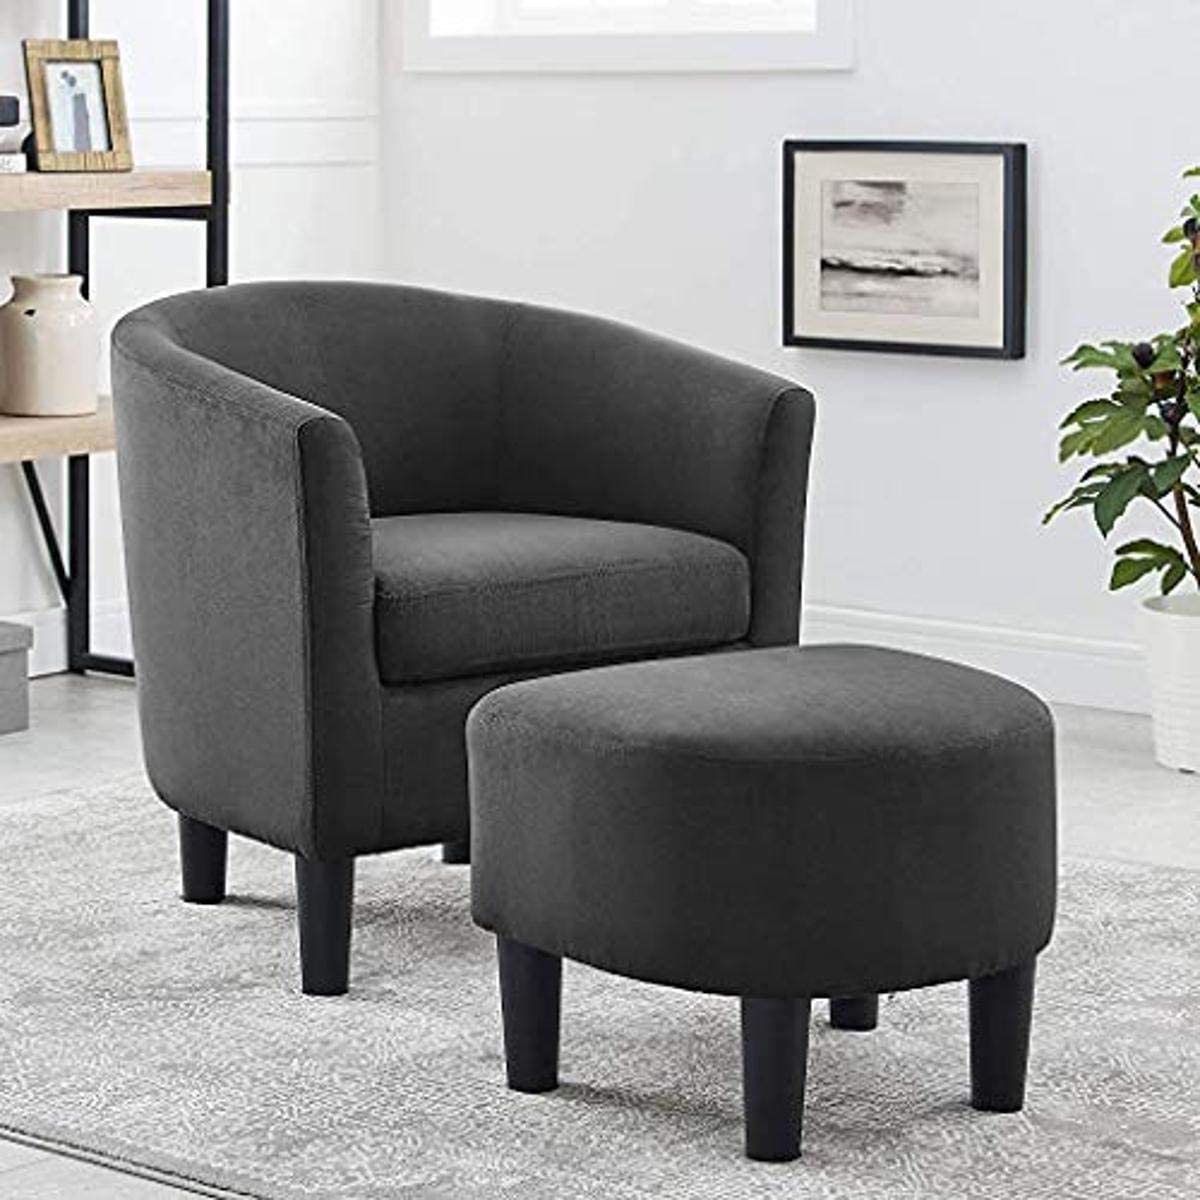 Oadeer Home DD7983 Chair Sofas, Blue Gray